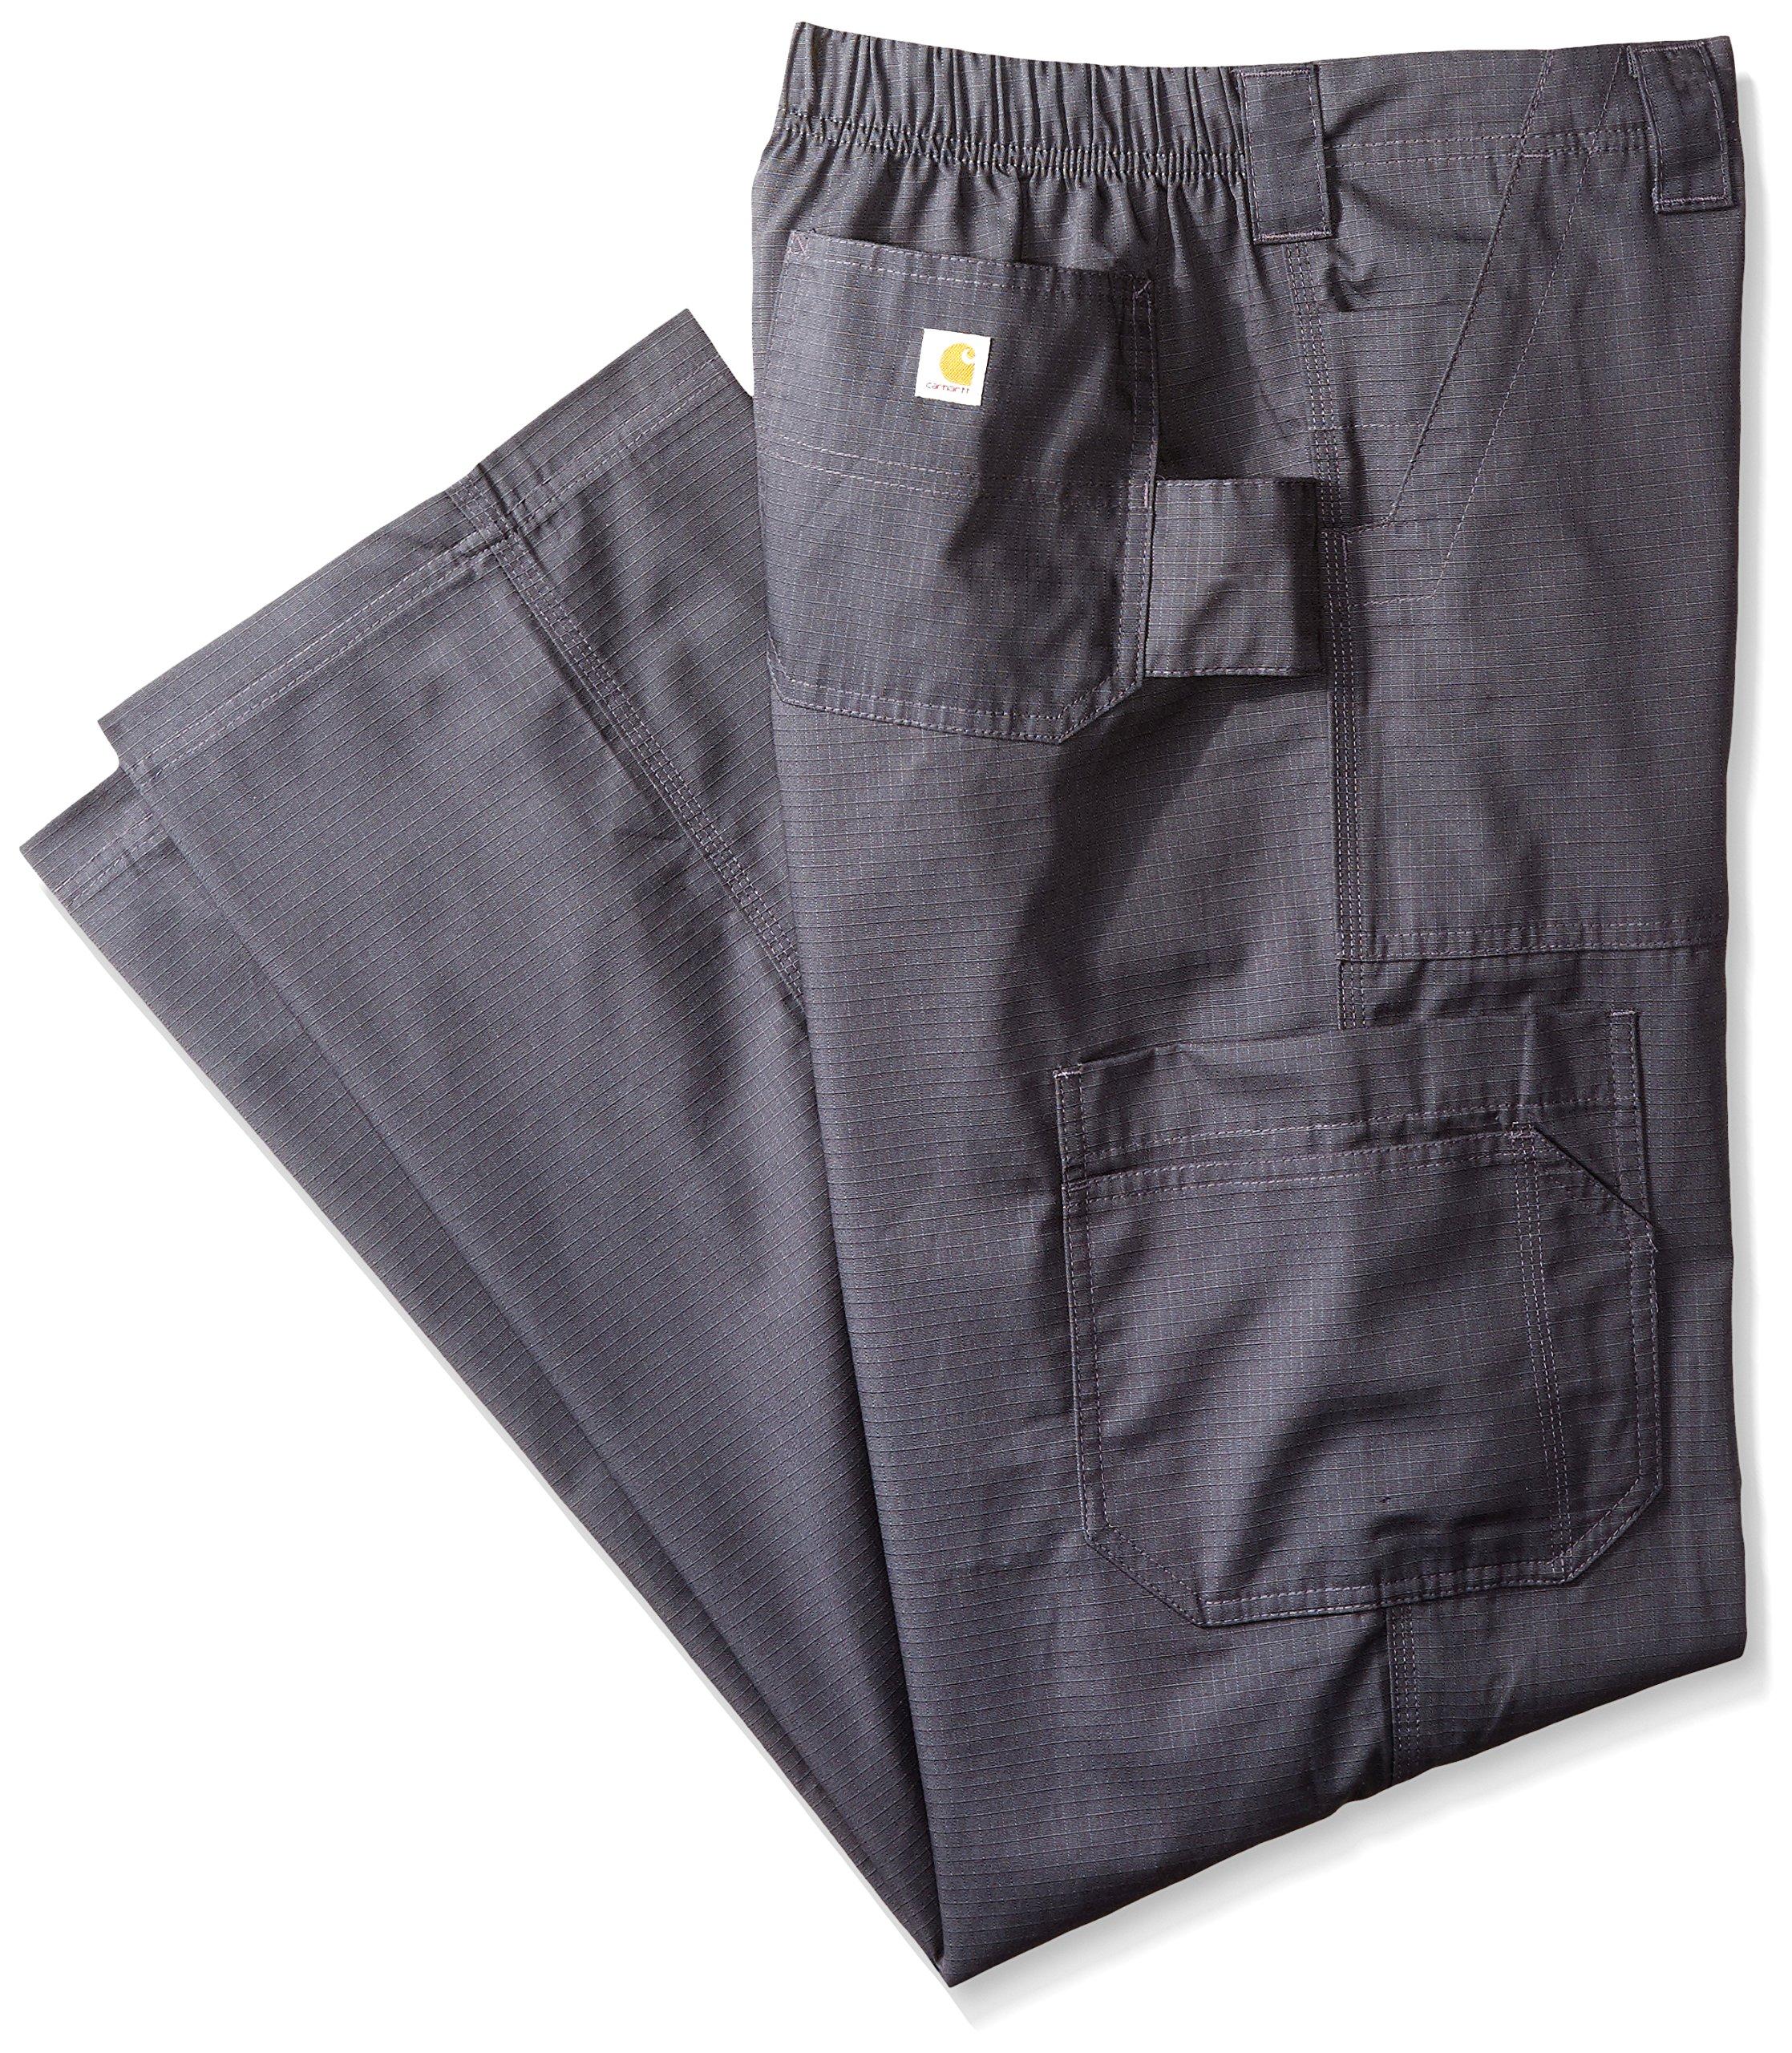 Carhartt Men's Tall Ripstop Multi-Cargo Scrub Pant, Dark Pewter, Large/Tall